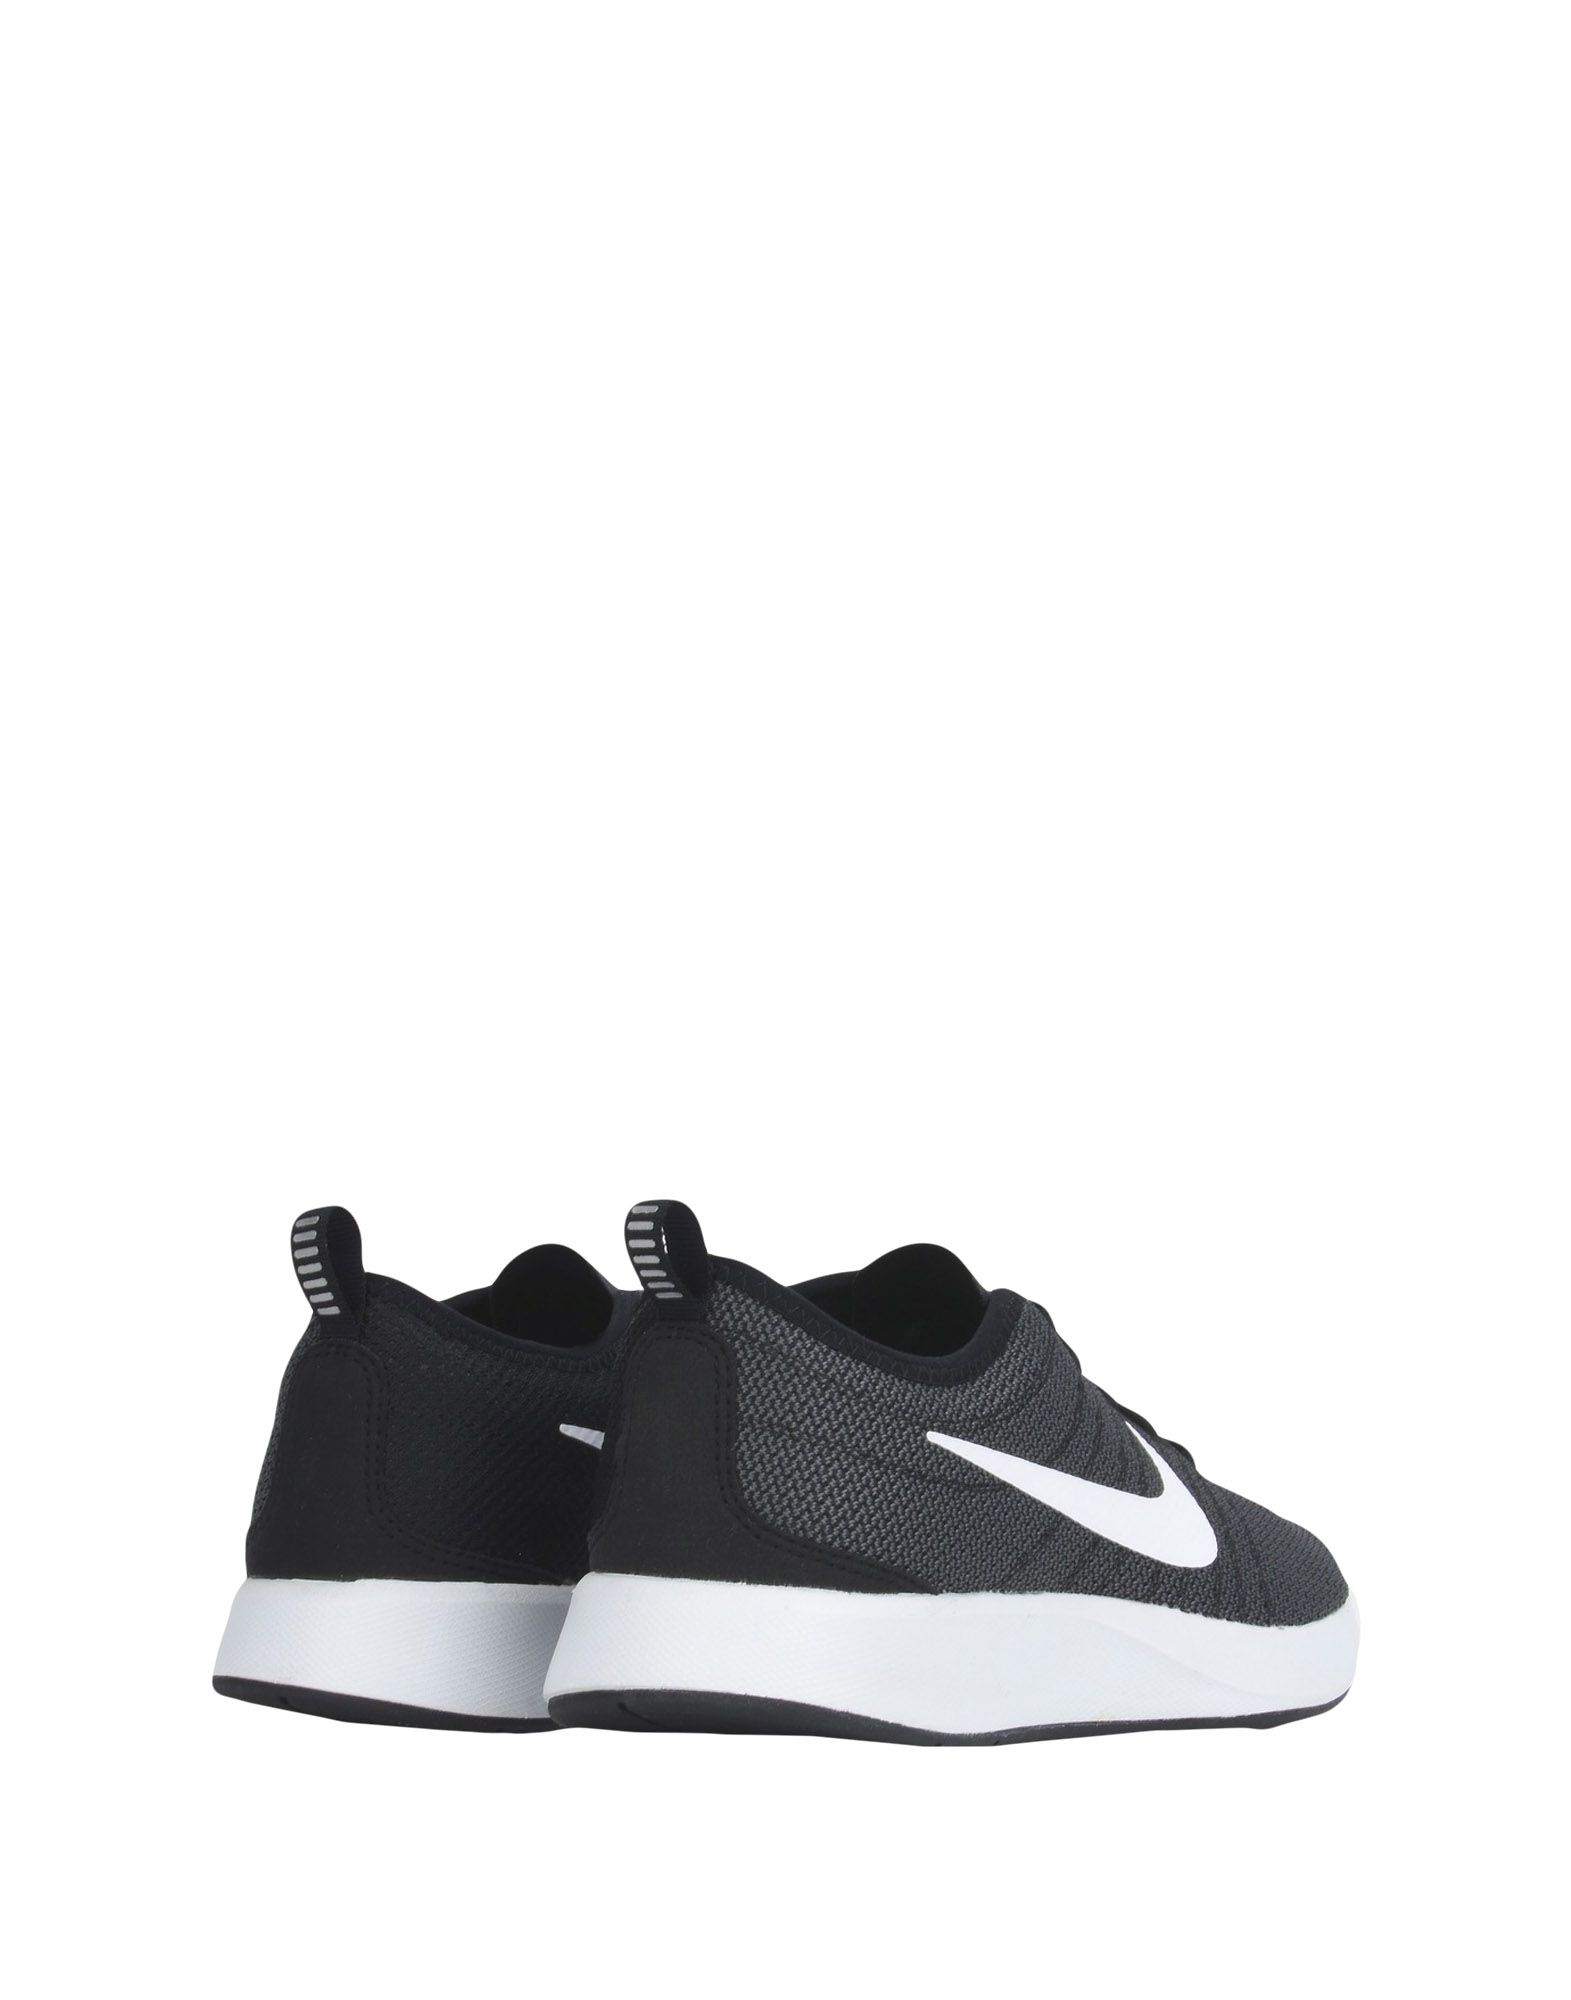 Sneakers Nike    Dualtone Racer - Femme - Sneakers Nike sur